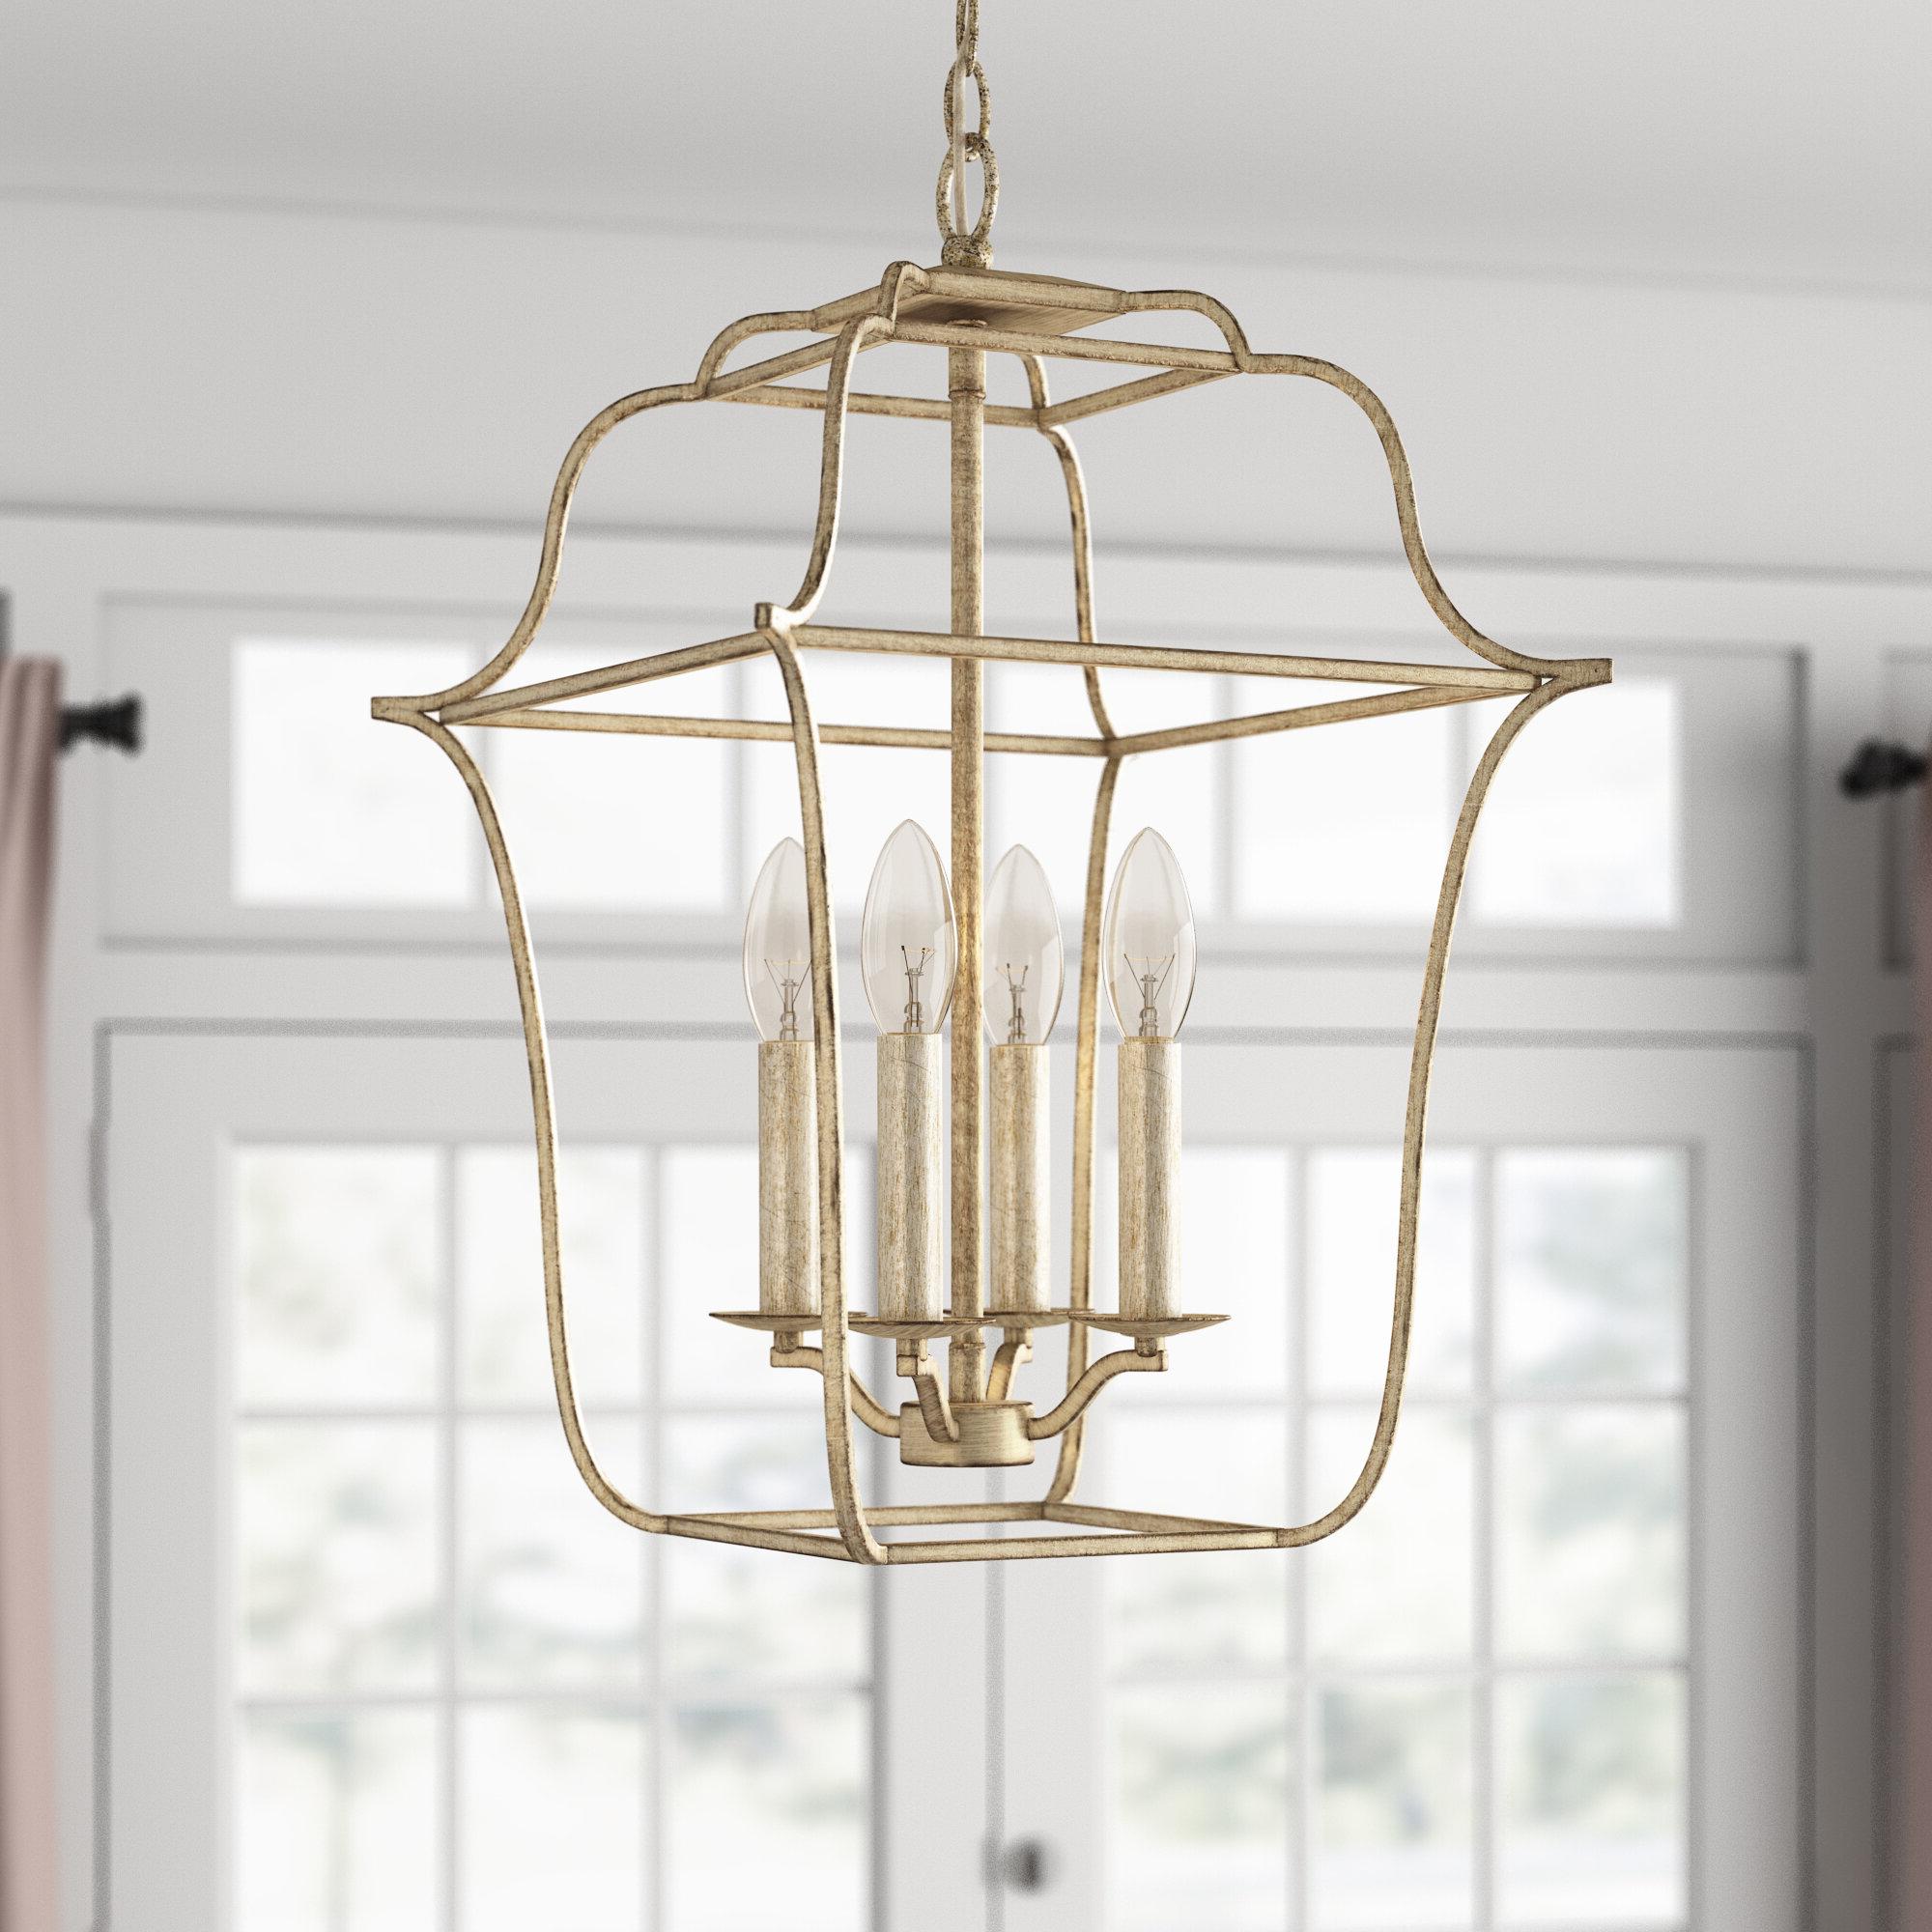 Famous Chloe 4 Light Lantern Geometric Pendant & Reviews (View 12 of 25)